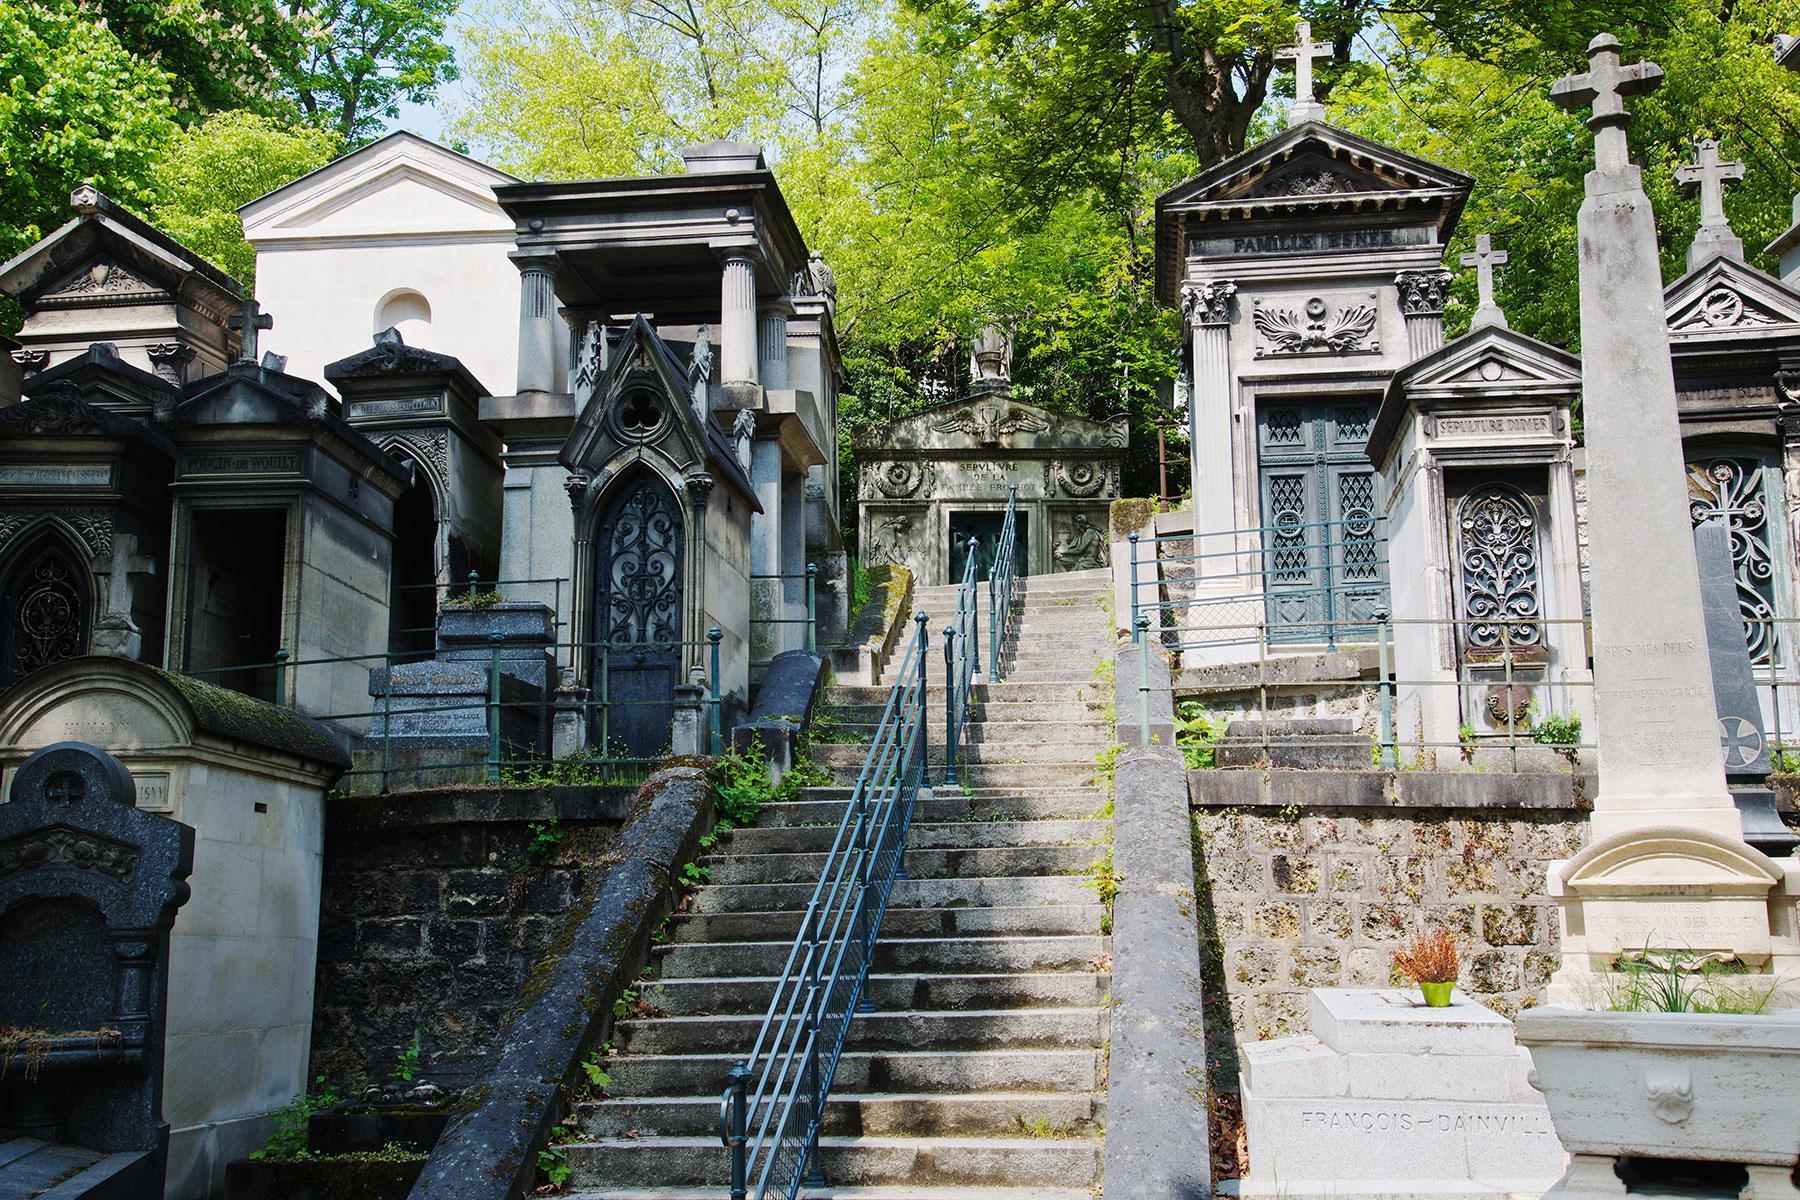 The world s most famous cemeteries fodors travel guide - Cimetiere pere la chaise ...